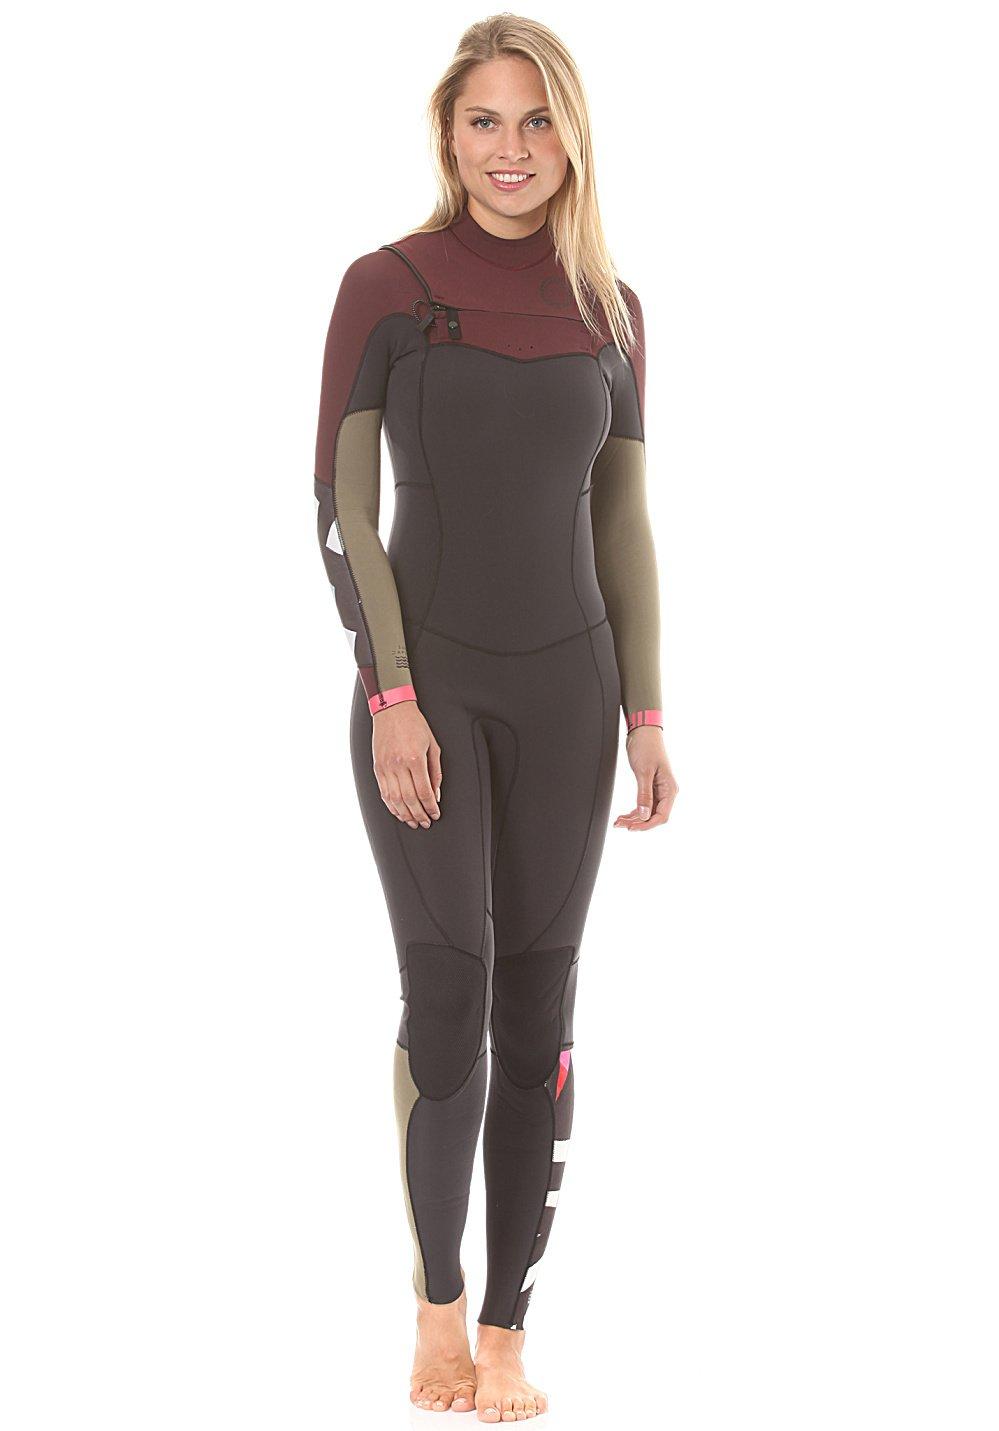 Billabong 2017レディースSalty Dayz 3 / 2 mm Chest Zip Wetsuit Mulberry f43g15 Ladies 4   B073NYW753